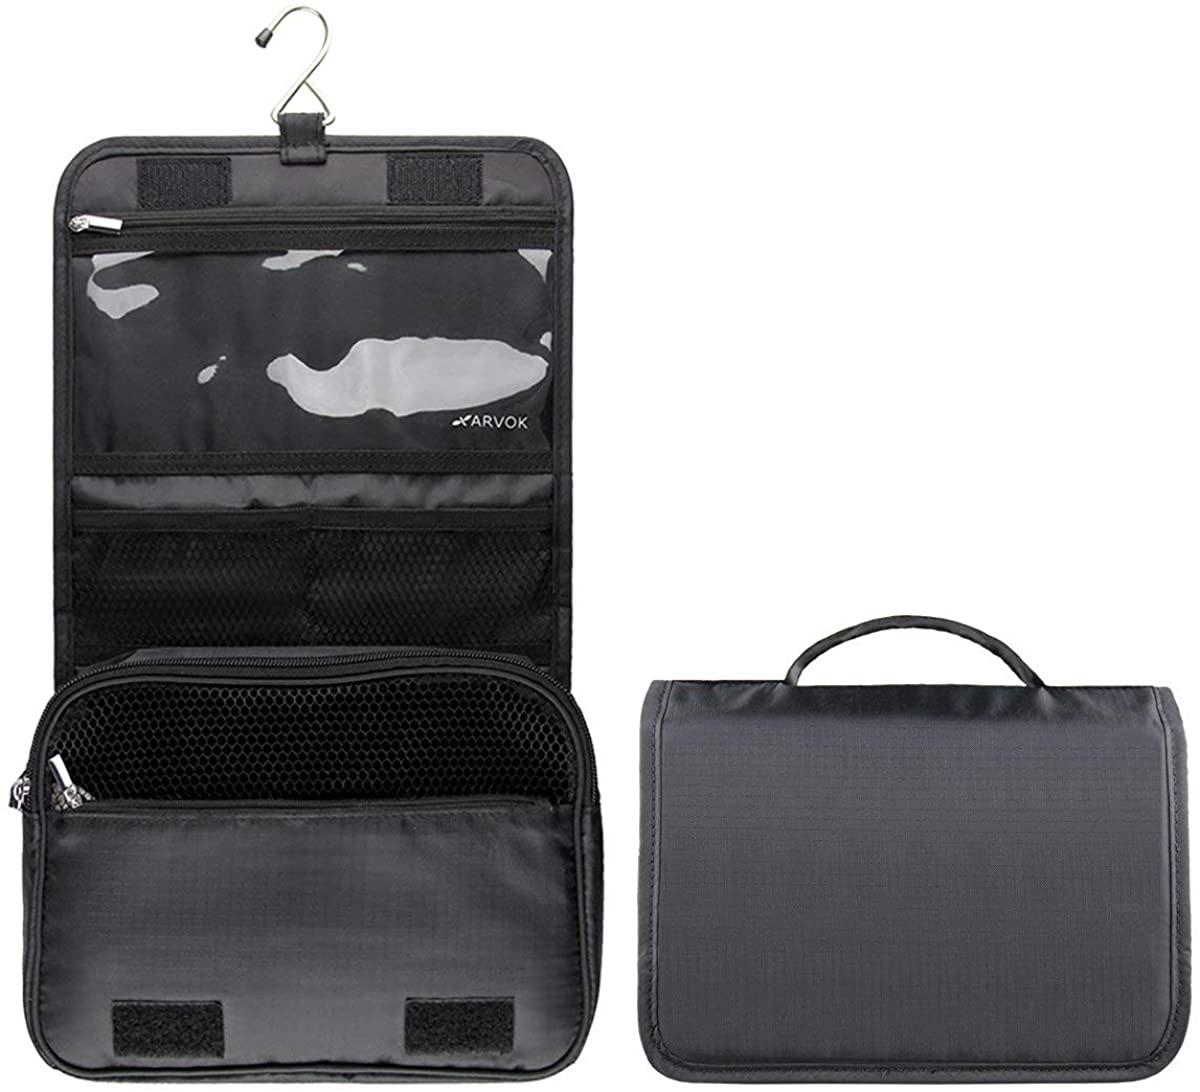 Arvok Hanging Toiletry Bag, water-resistant Travel Wash Bag Portable Makeup Cosmetic Organizer for Men & Women Folding with Multi Pockets